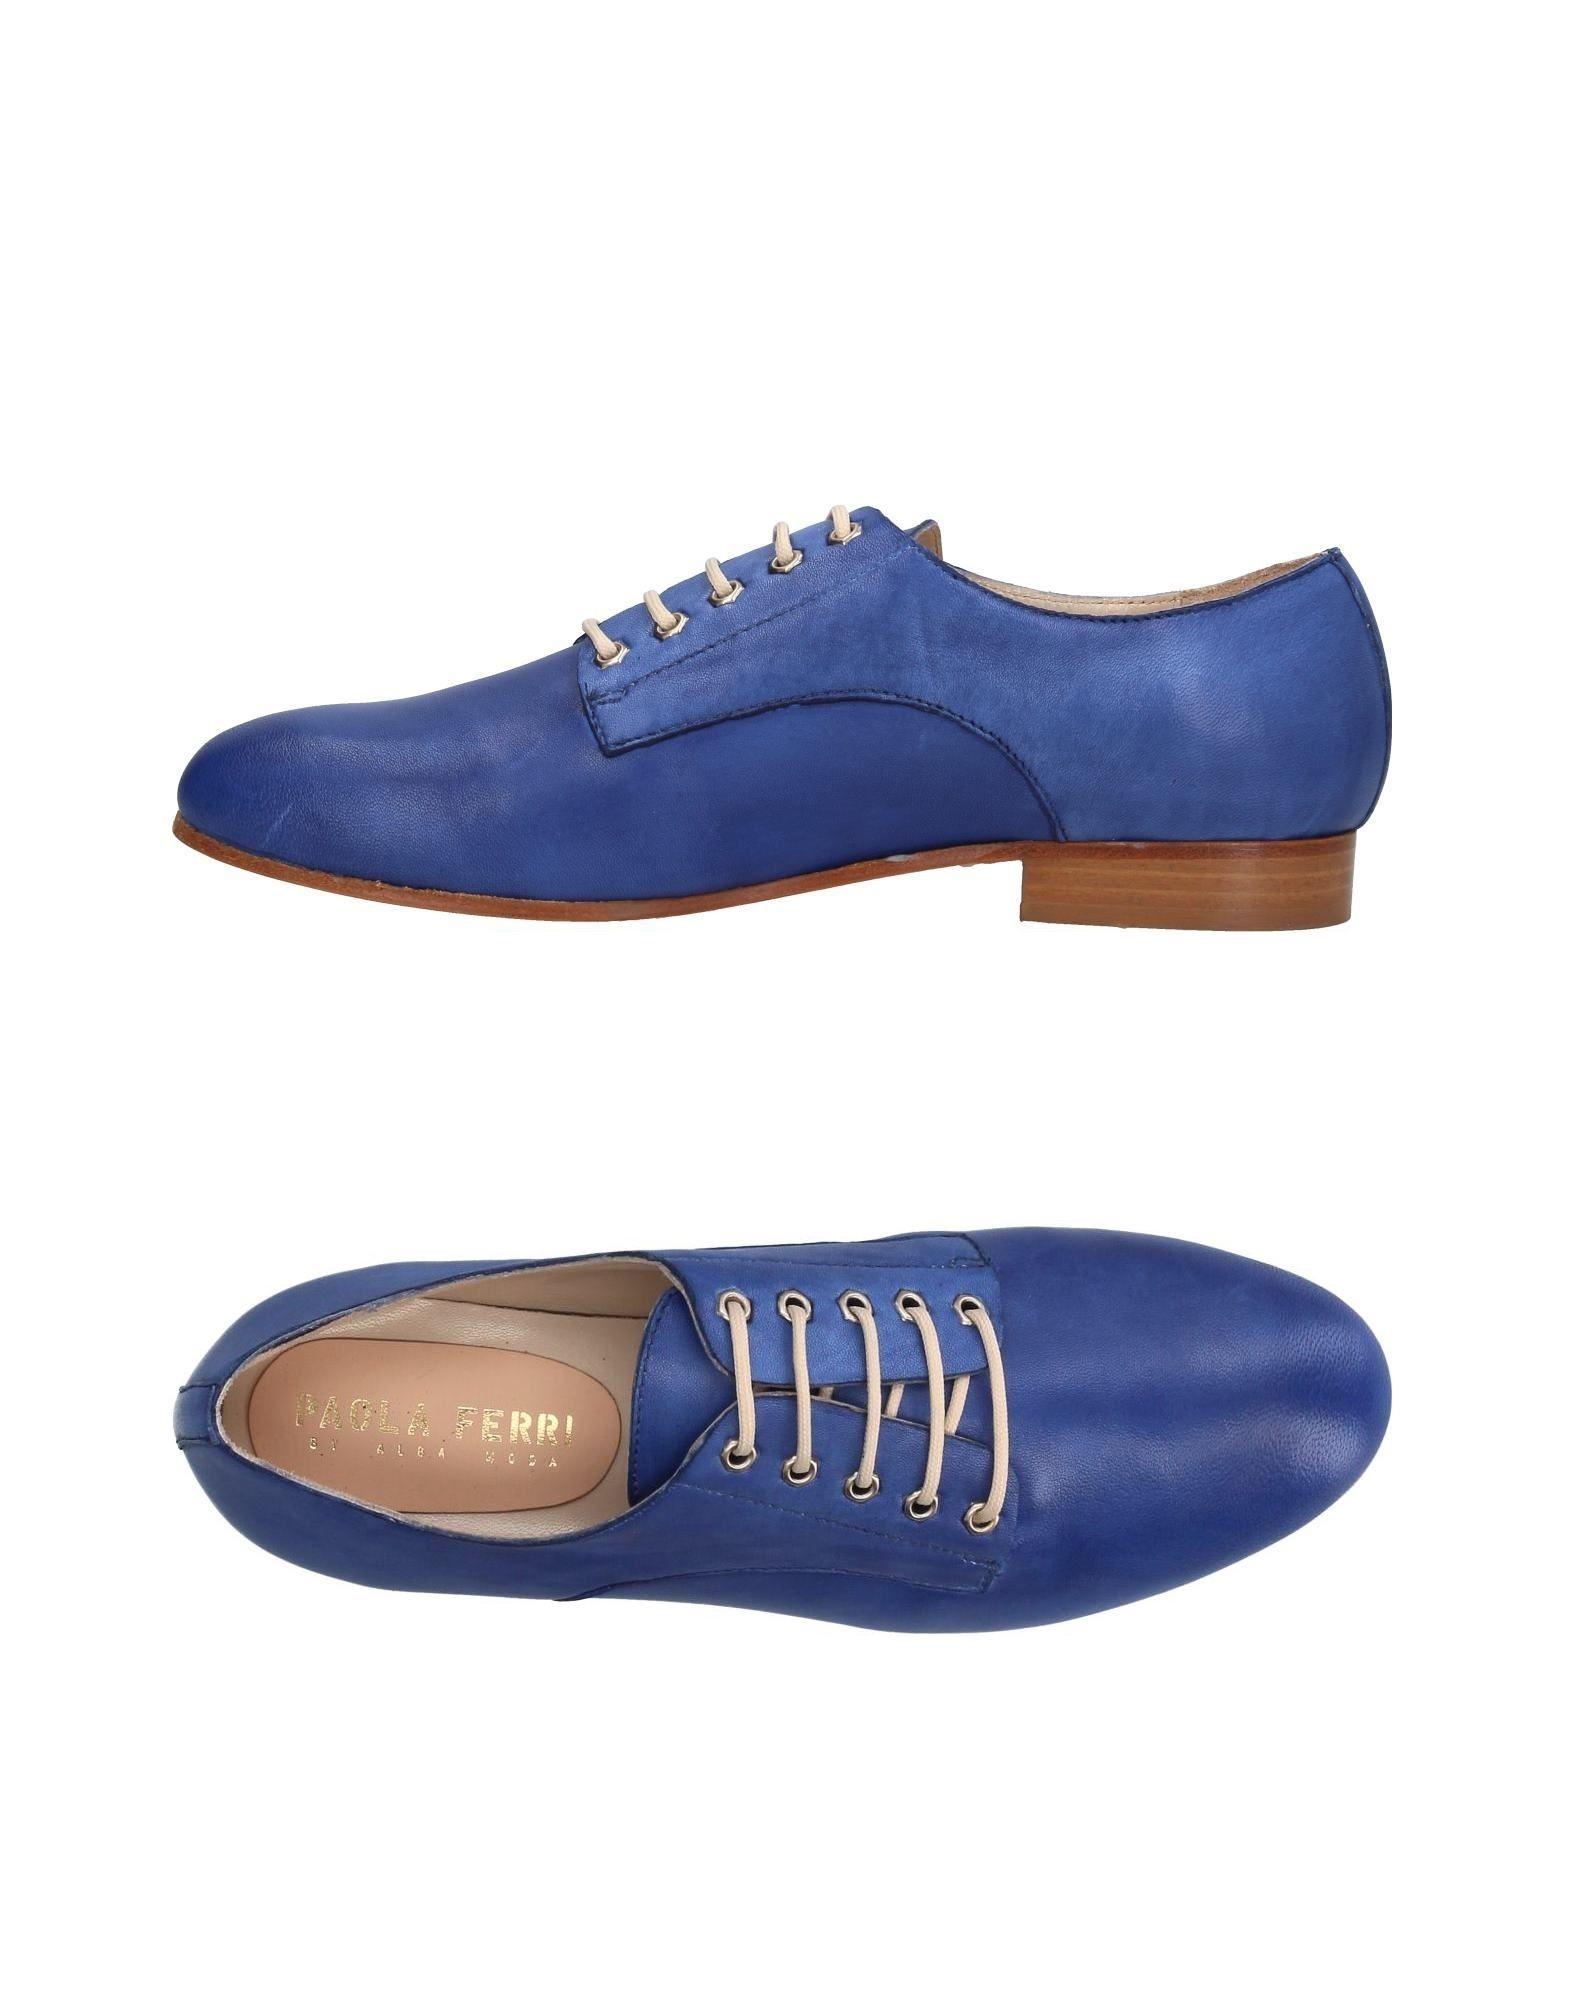 PAOLA FERRI Обувь на шнурках mantra paola 3532